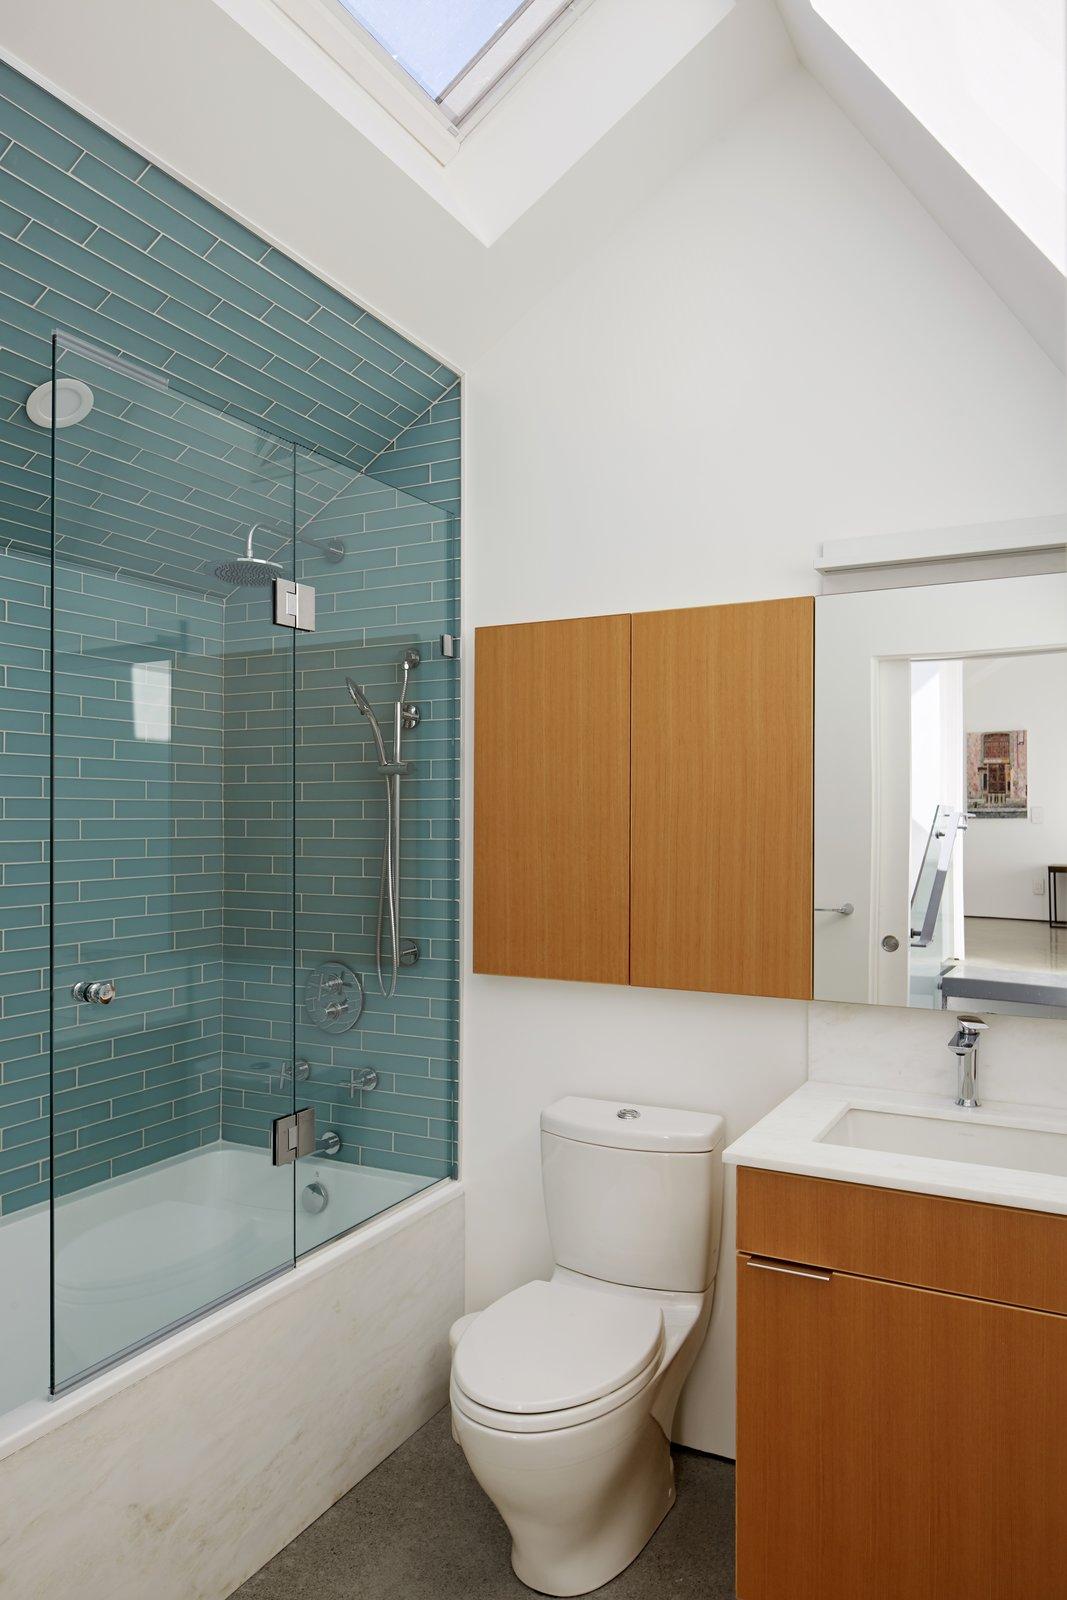 College Laneway House bathroom